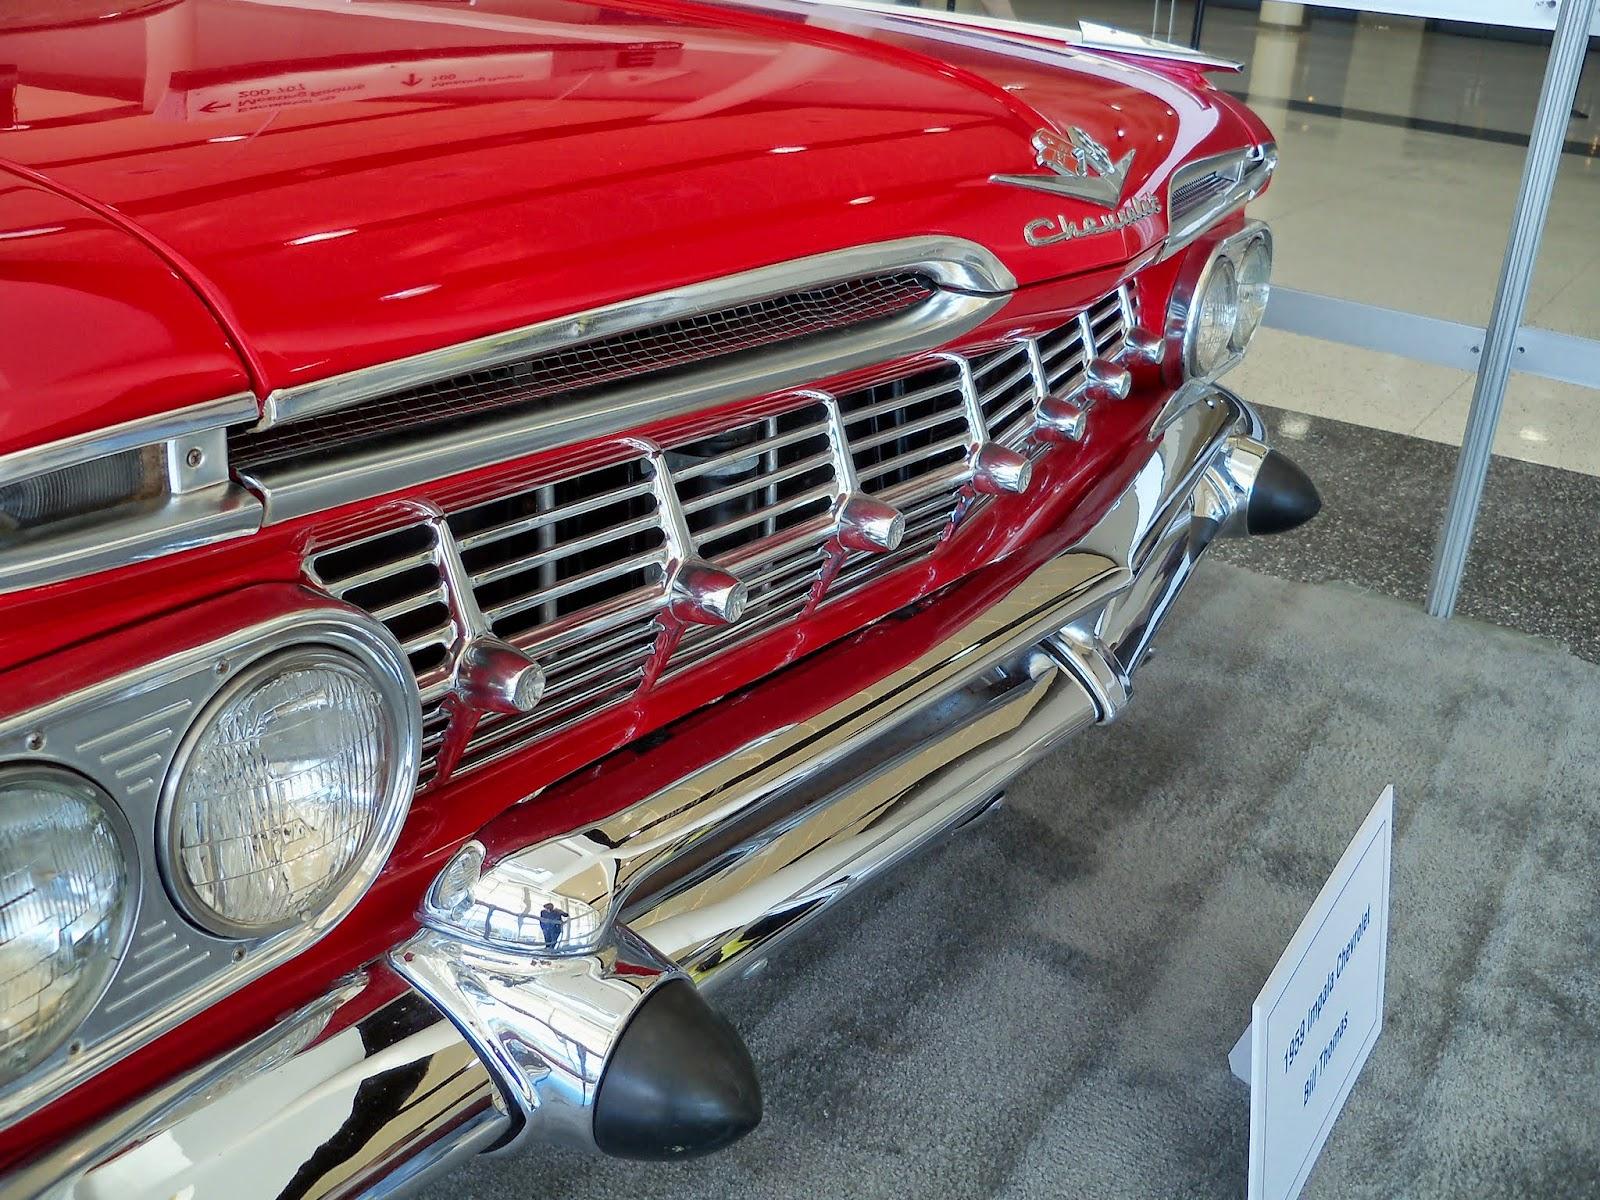 Houston Auto Show 2015 - 116_7200.JPG